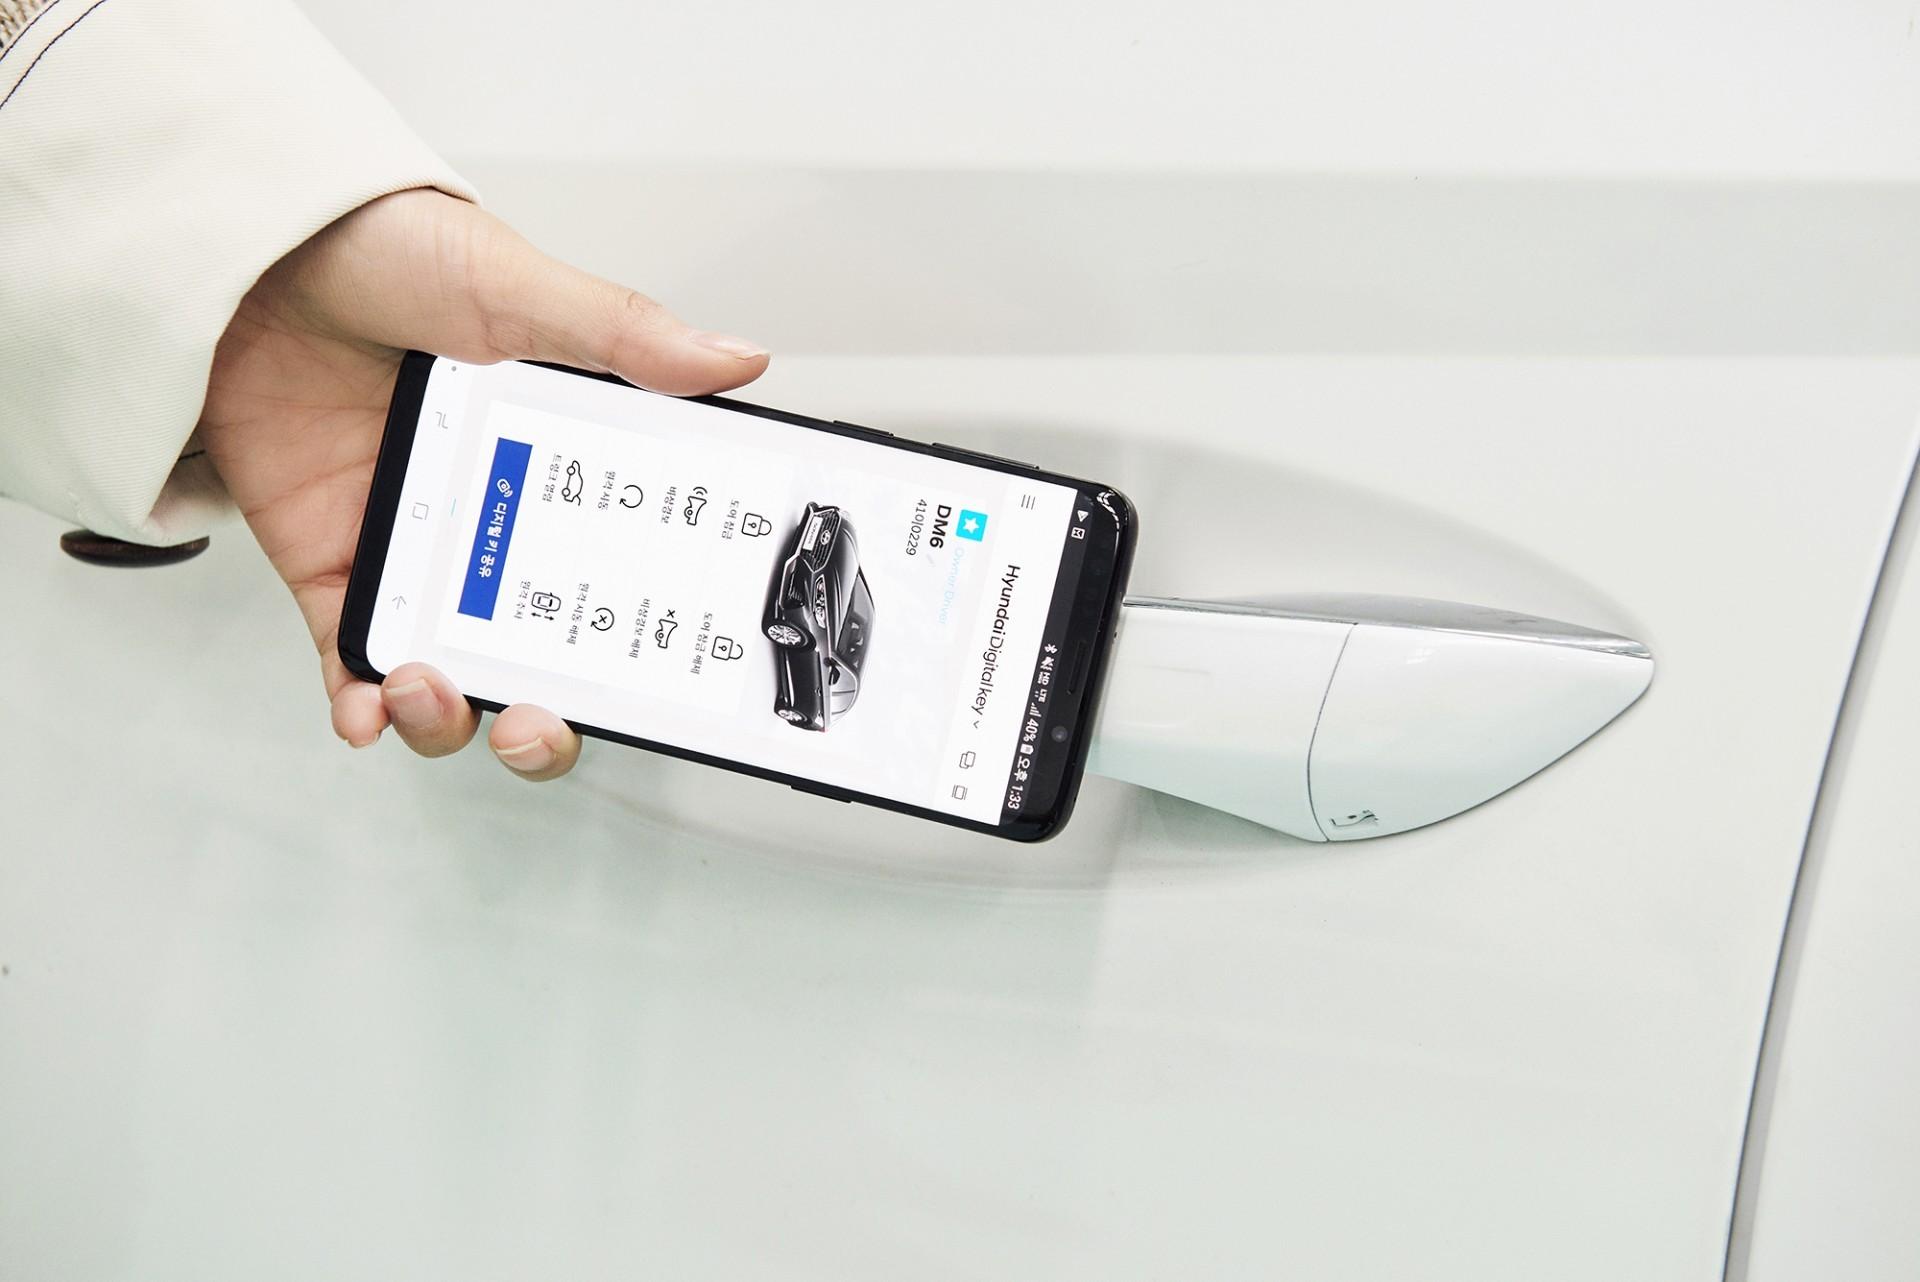 190304_Hyundai Motor Group Develops Smartphone-based Digital Key_Press Photo1